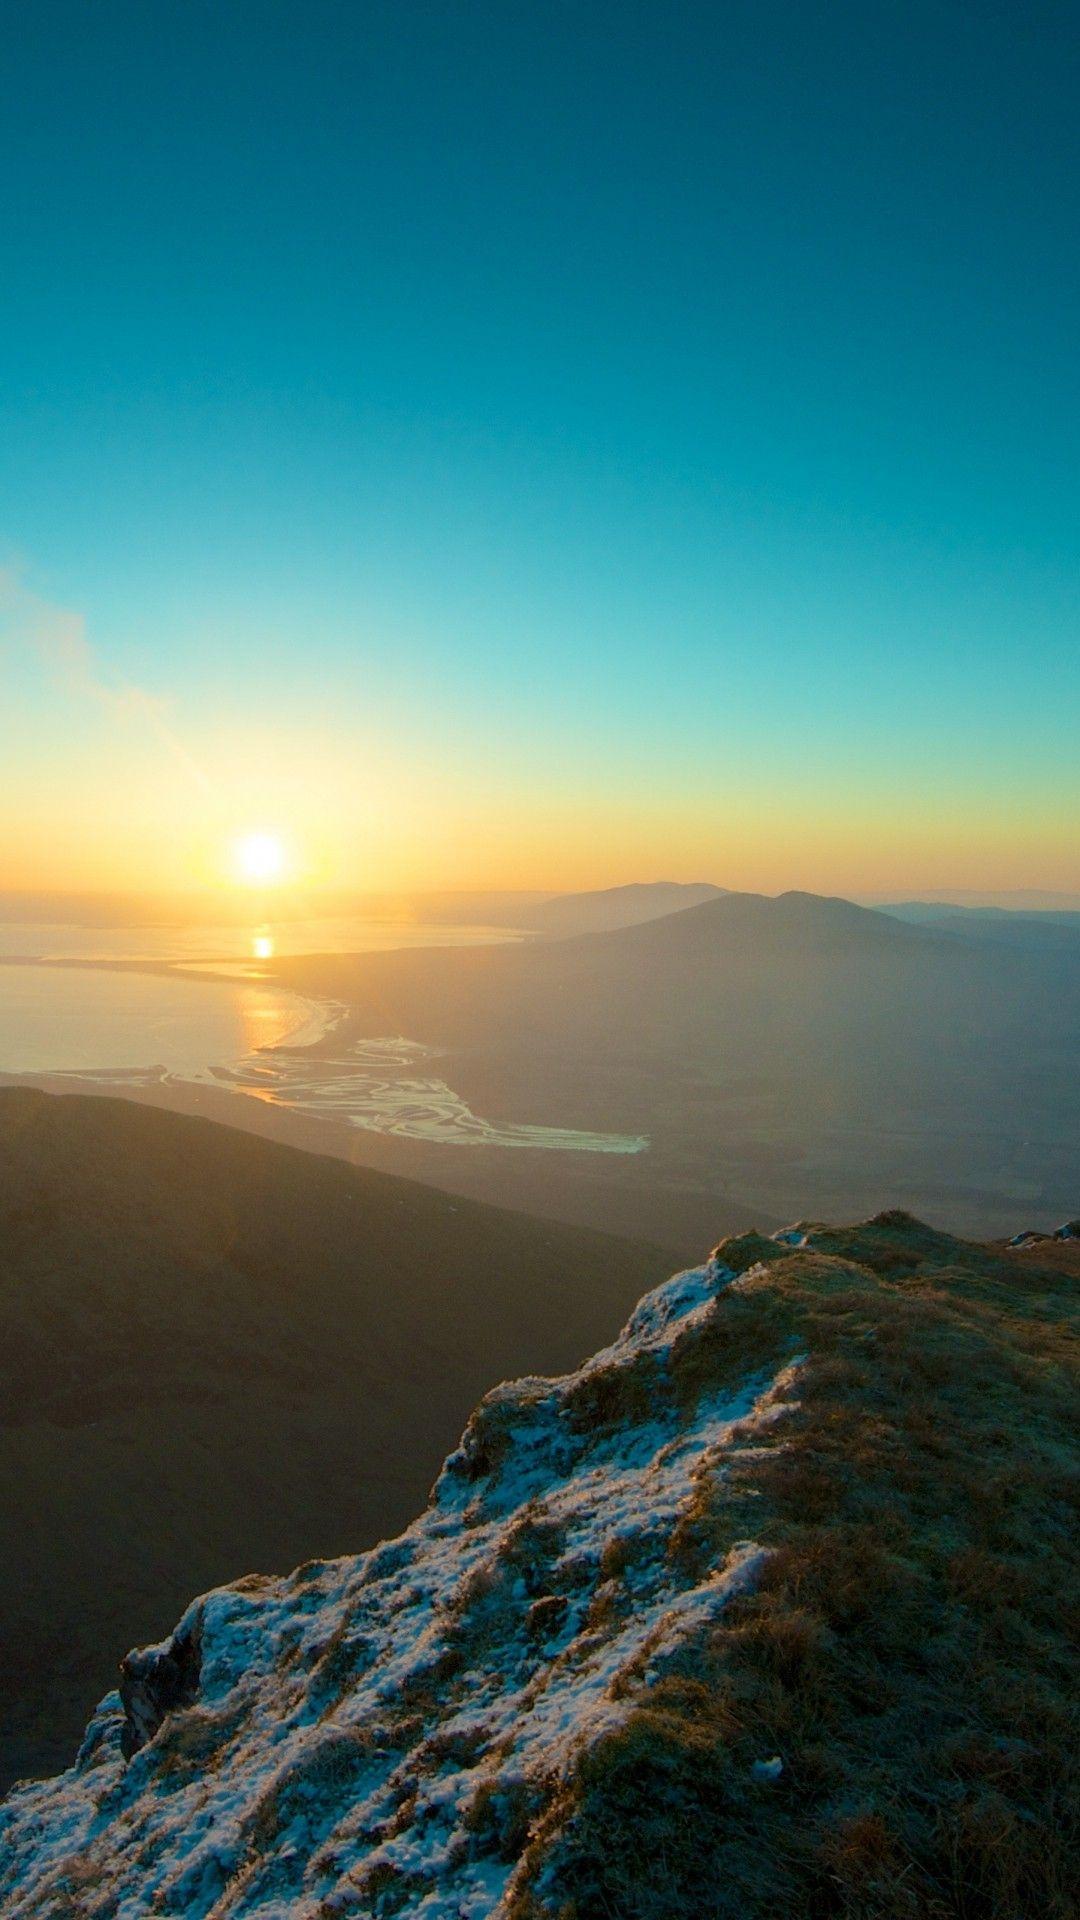 mountains sky sunset peaks iphone 6 plus wallpaper - sun, river